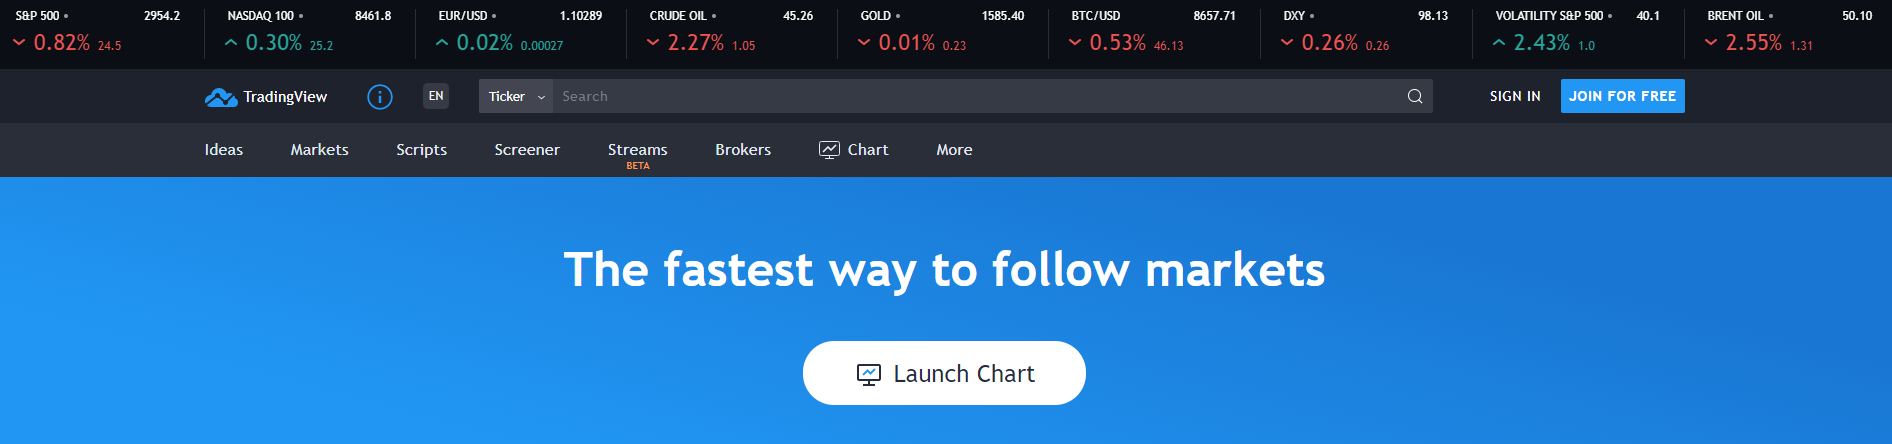 tradingview.com Startseite